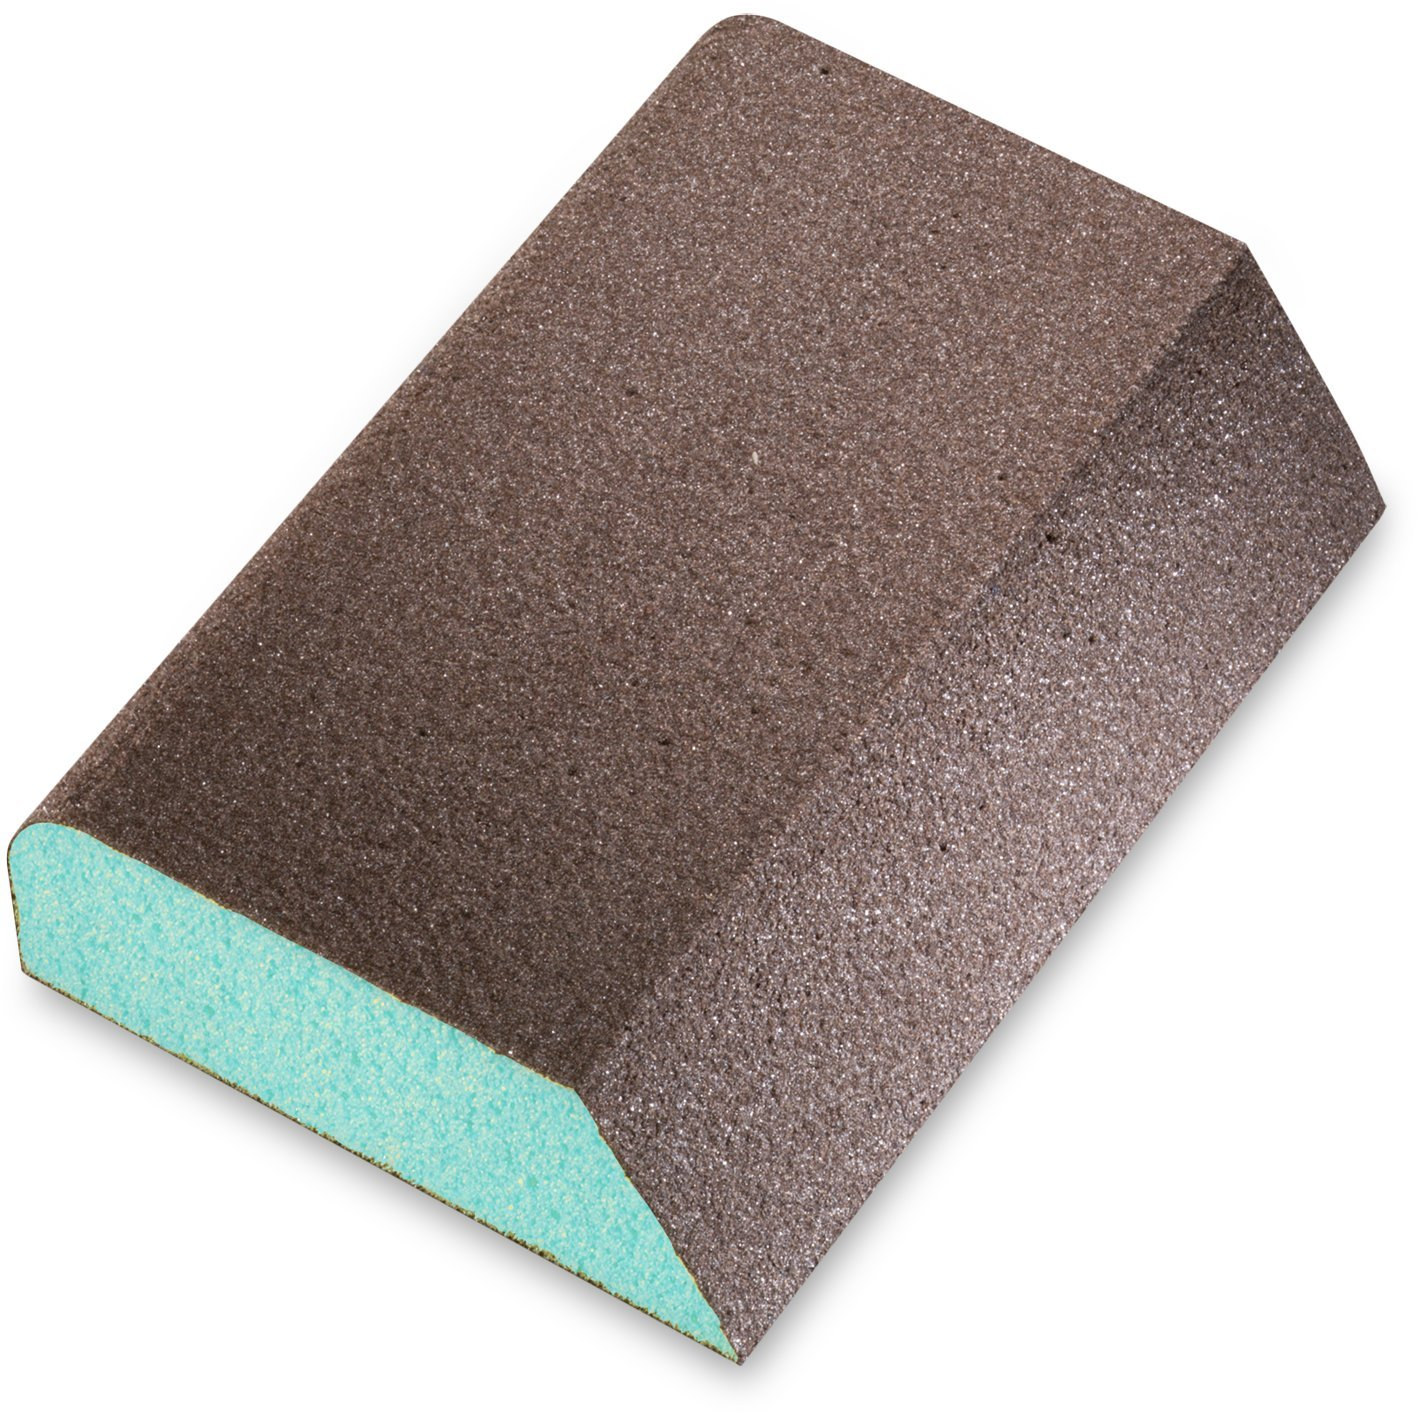 SIA Abrasives 0070.1241.01 Series 7990 siasponge Block Hard Abrasive, PUR Backing, Aluminum Oxide Grit, Coated 4 Sides, Superfine Grade, 2-3/4'' W, 3-3/4'' L, 1'' Thick (Pack of 10)